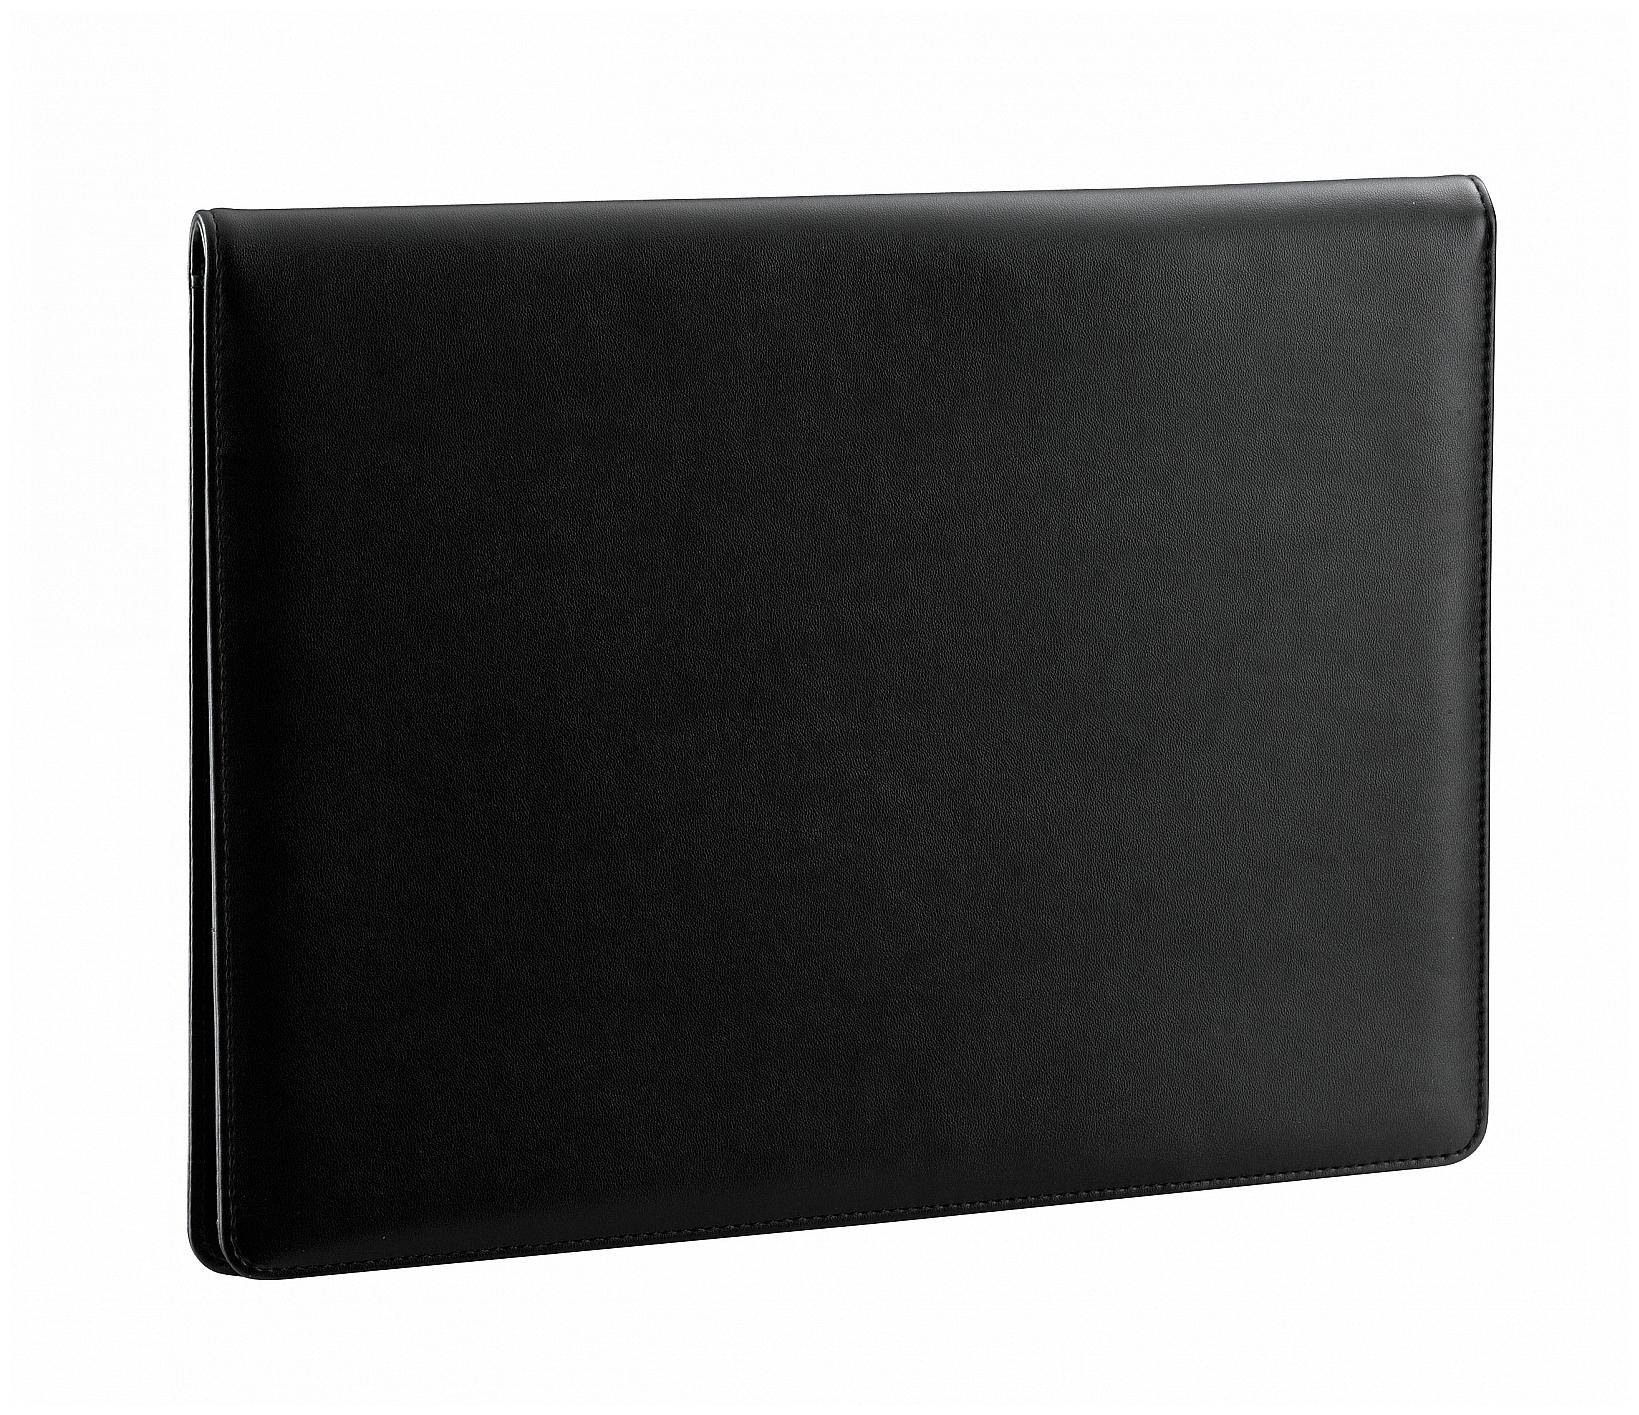 d & n Lederwaren Psací desky A4 s blokem 5094 černá